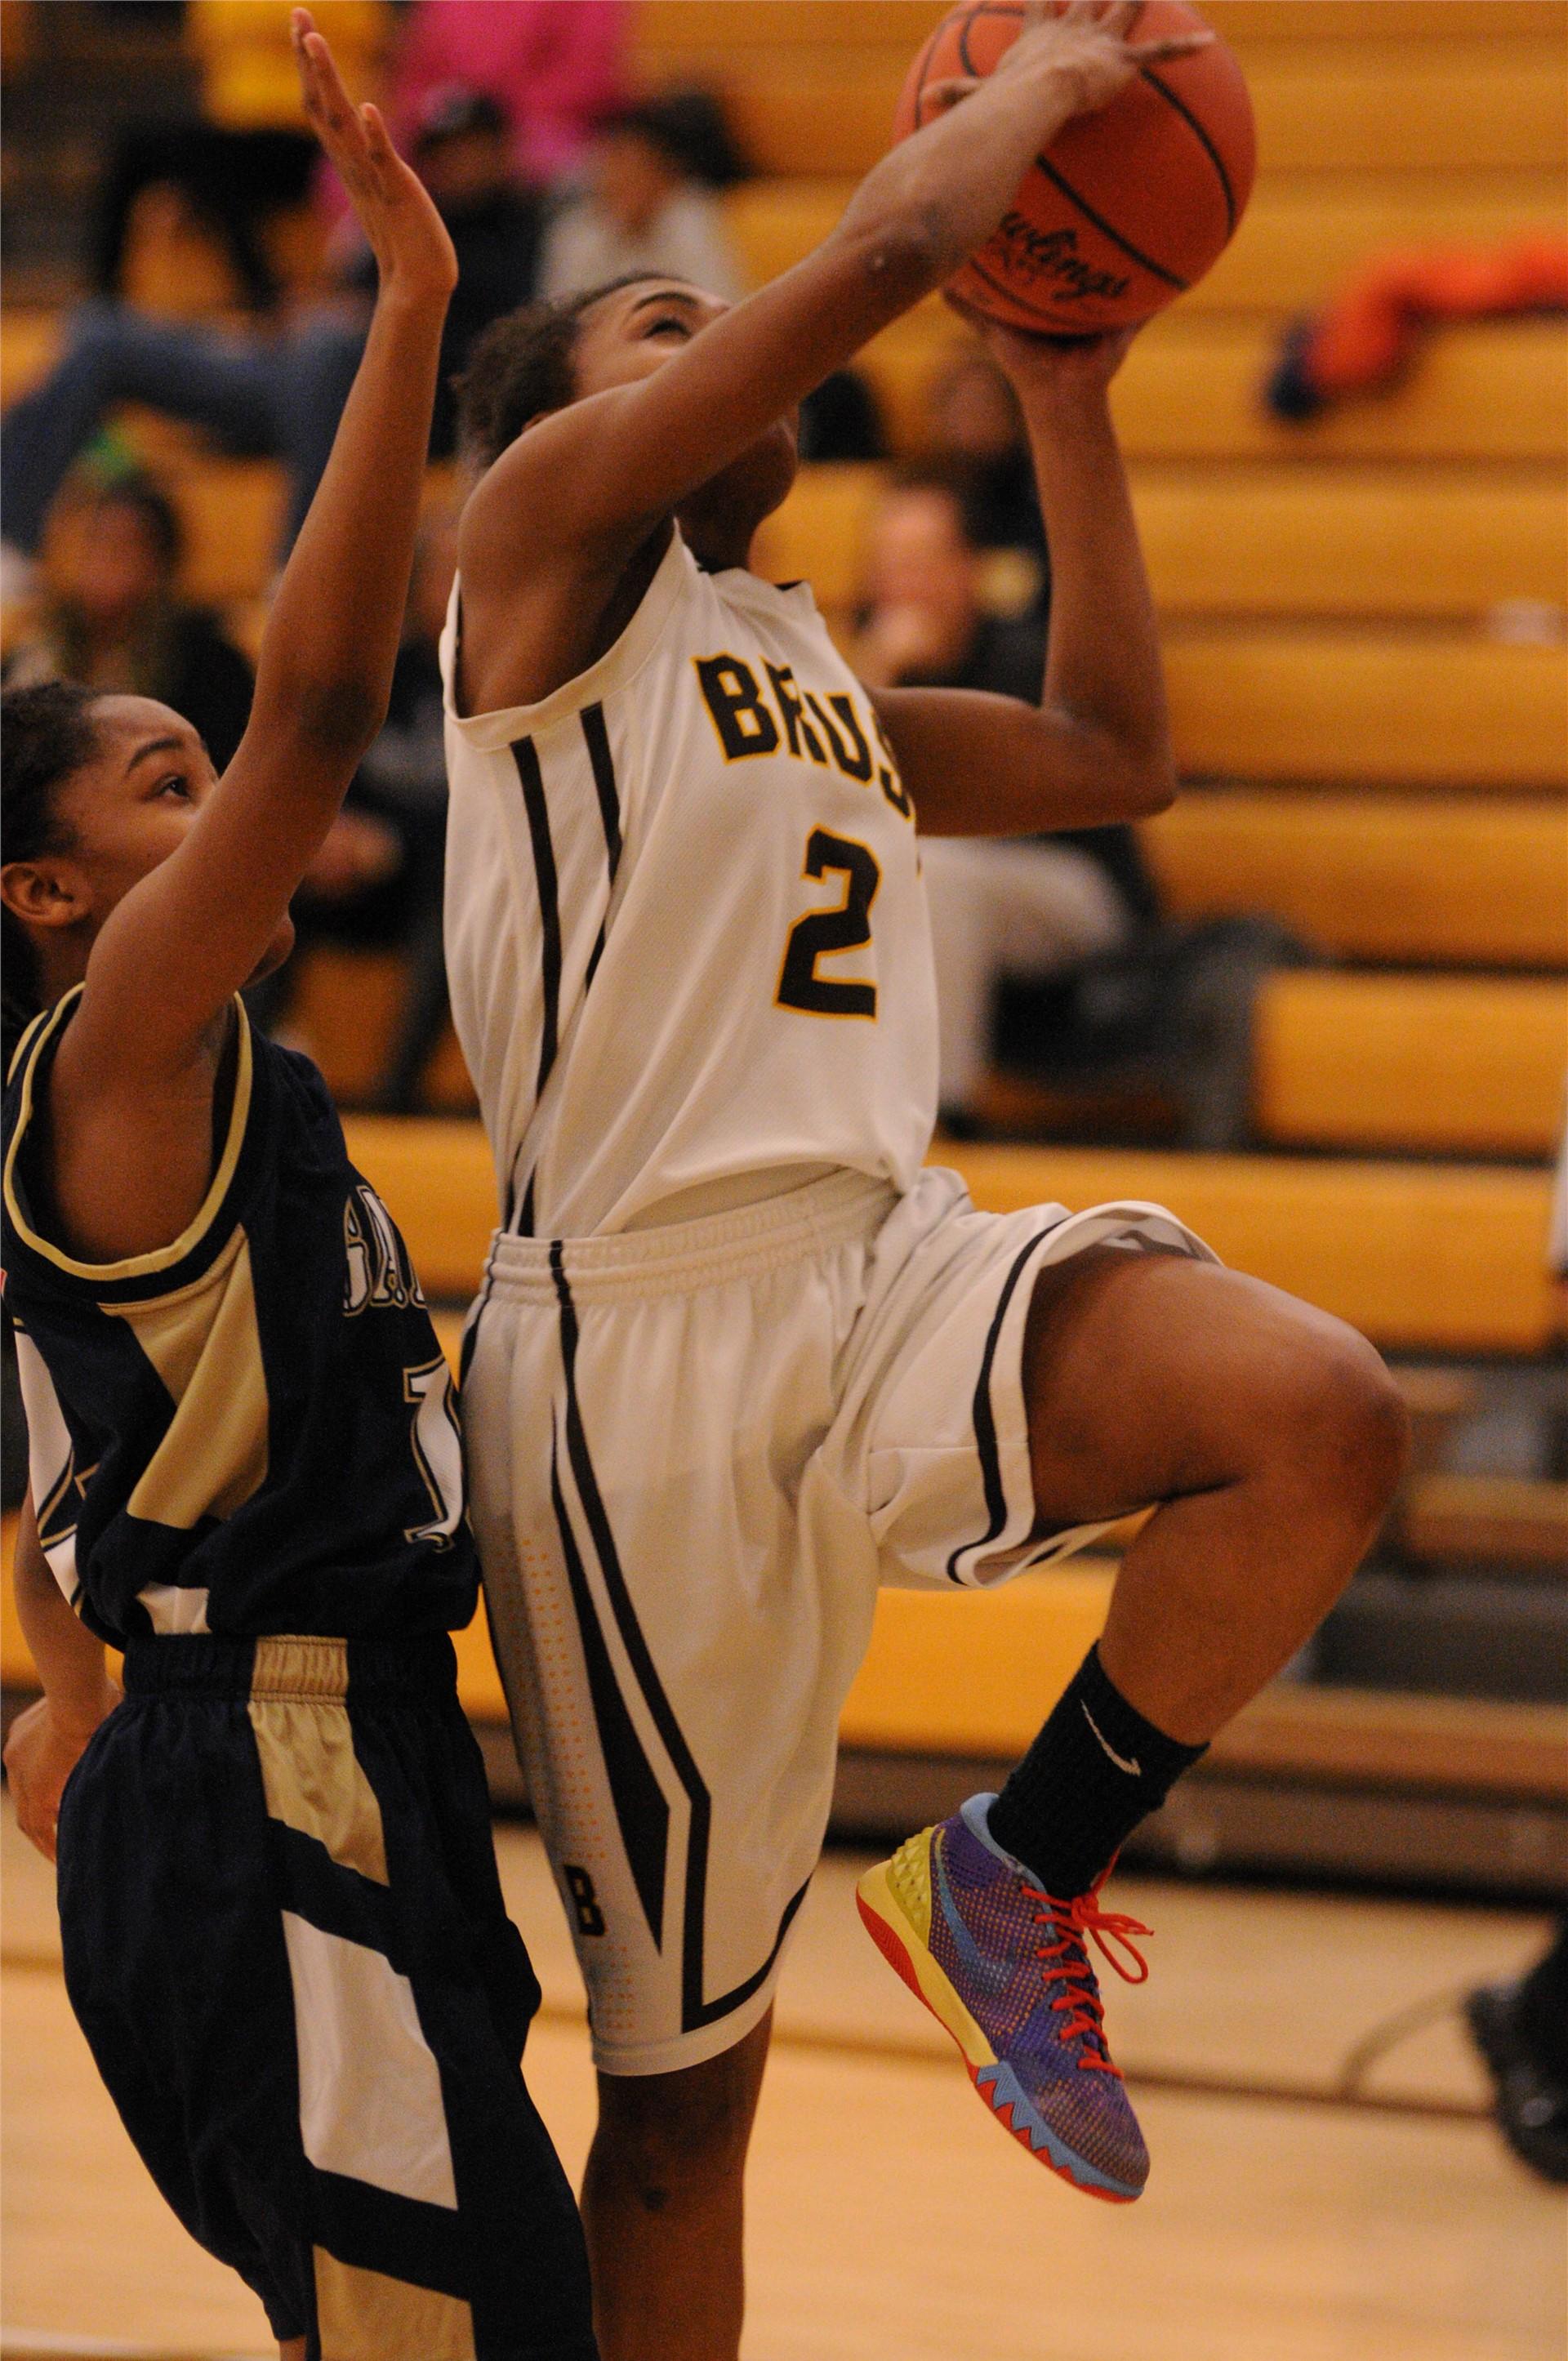 Office 365 Student Free >> Girls Basketball